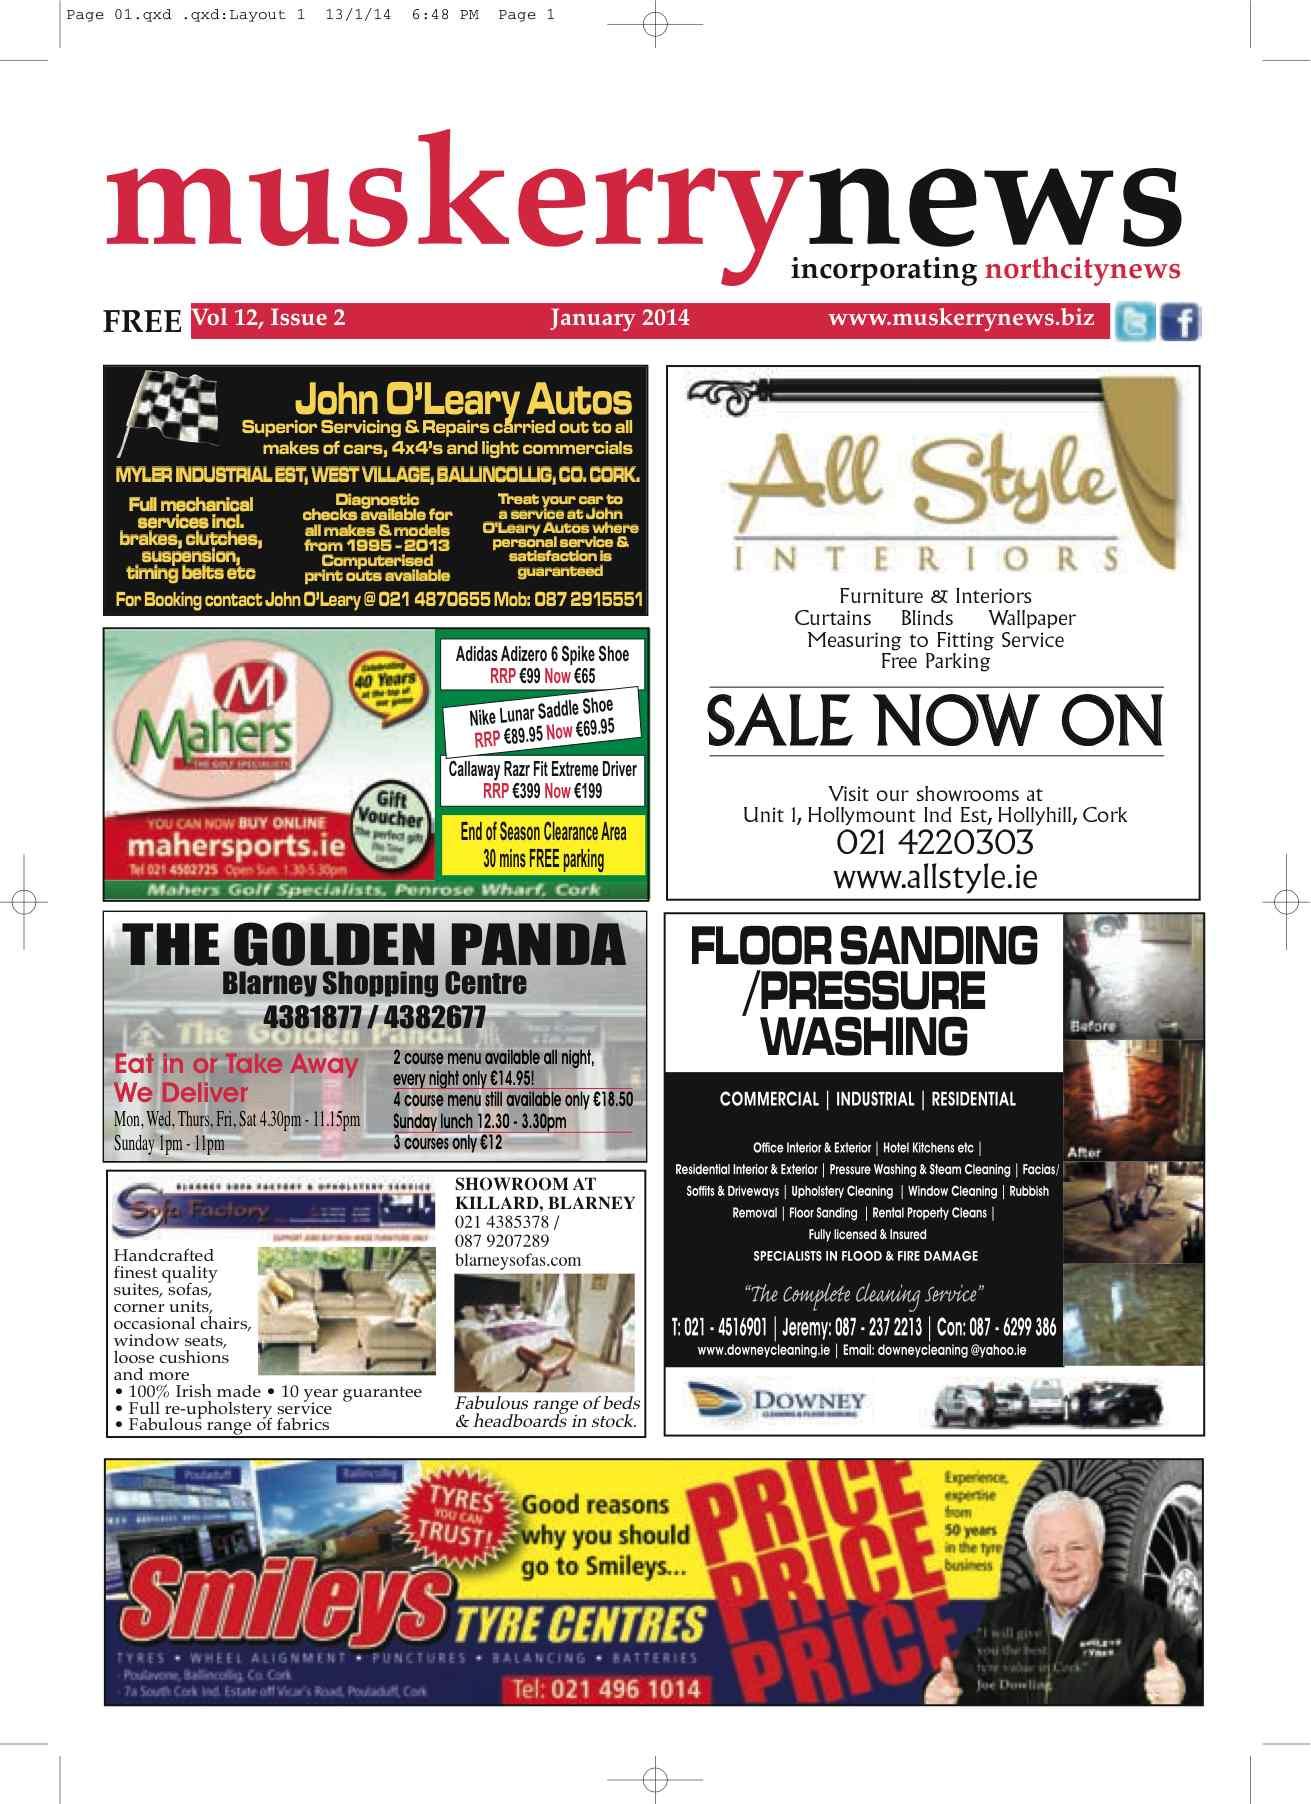 Muskerry News January 2014